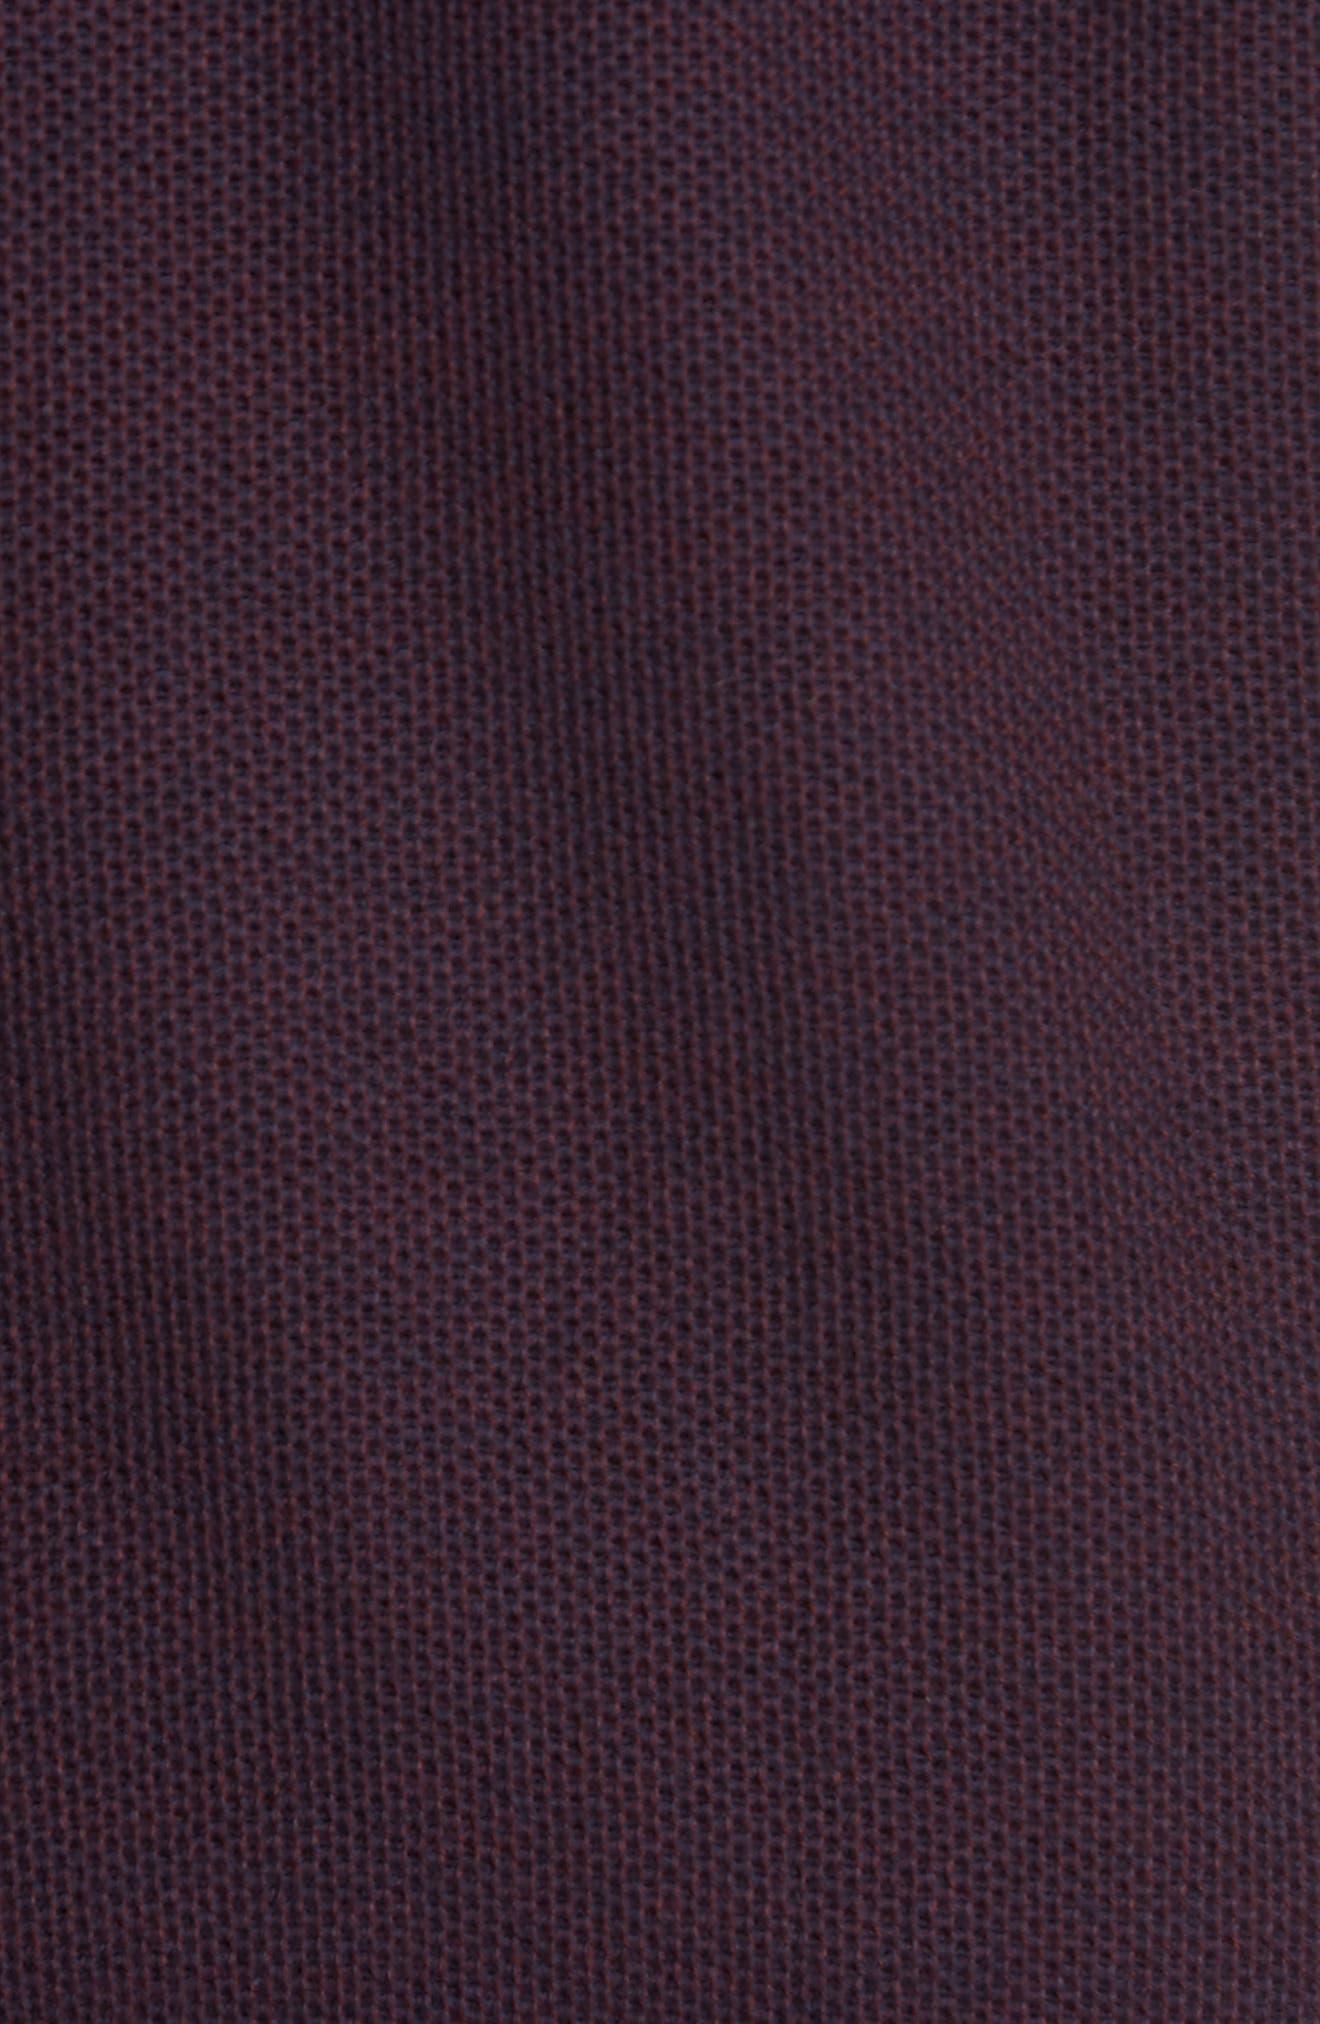 Space Dye Slim Fit Sweater,                             Alternate thumbnail 15, color,